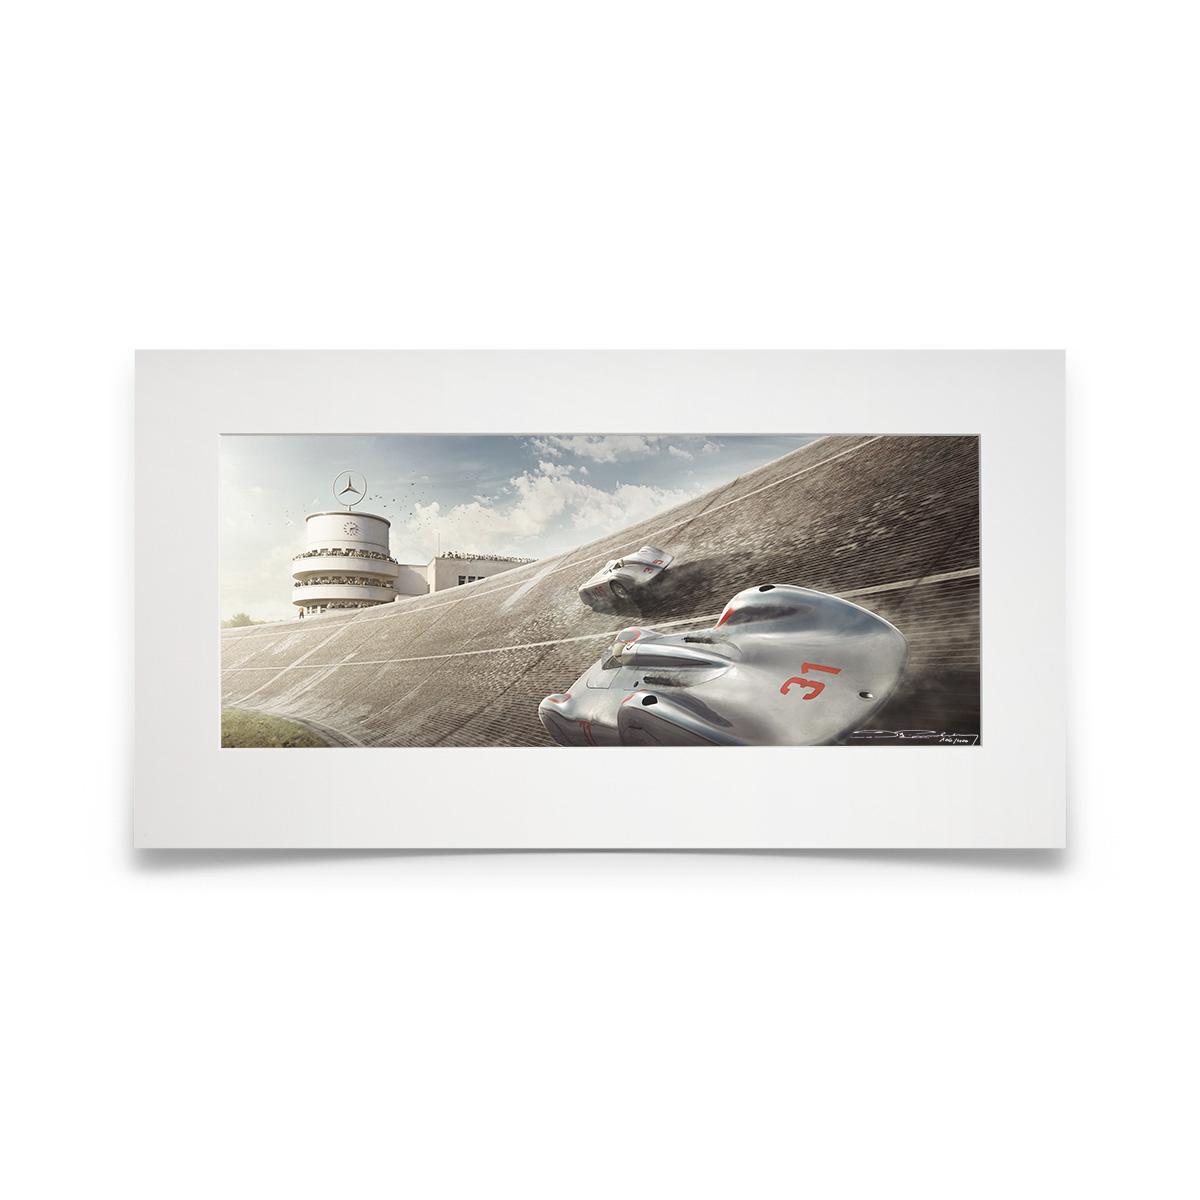 Product image for Steeper, Stronger, Faster   Bernd Rosemeyer - Auto Union - 1937   Automobilist   Fine Art